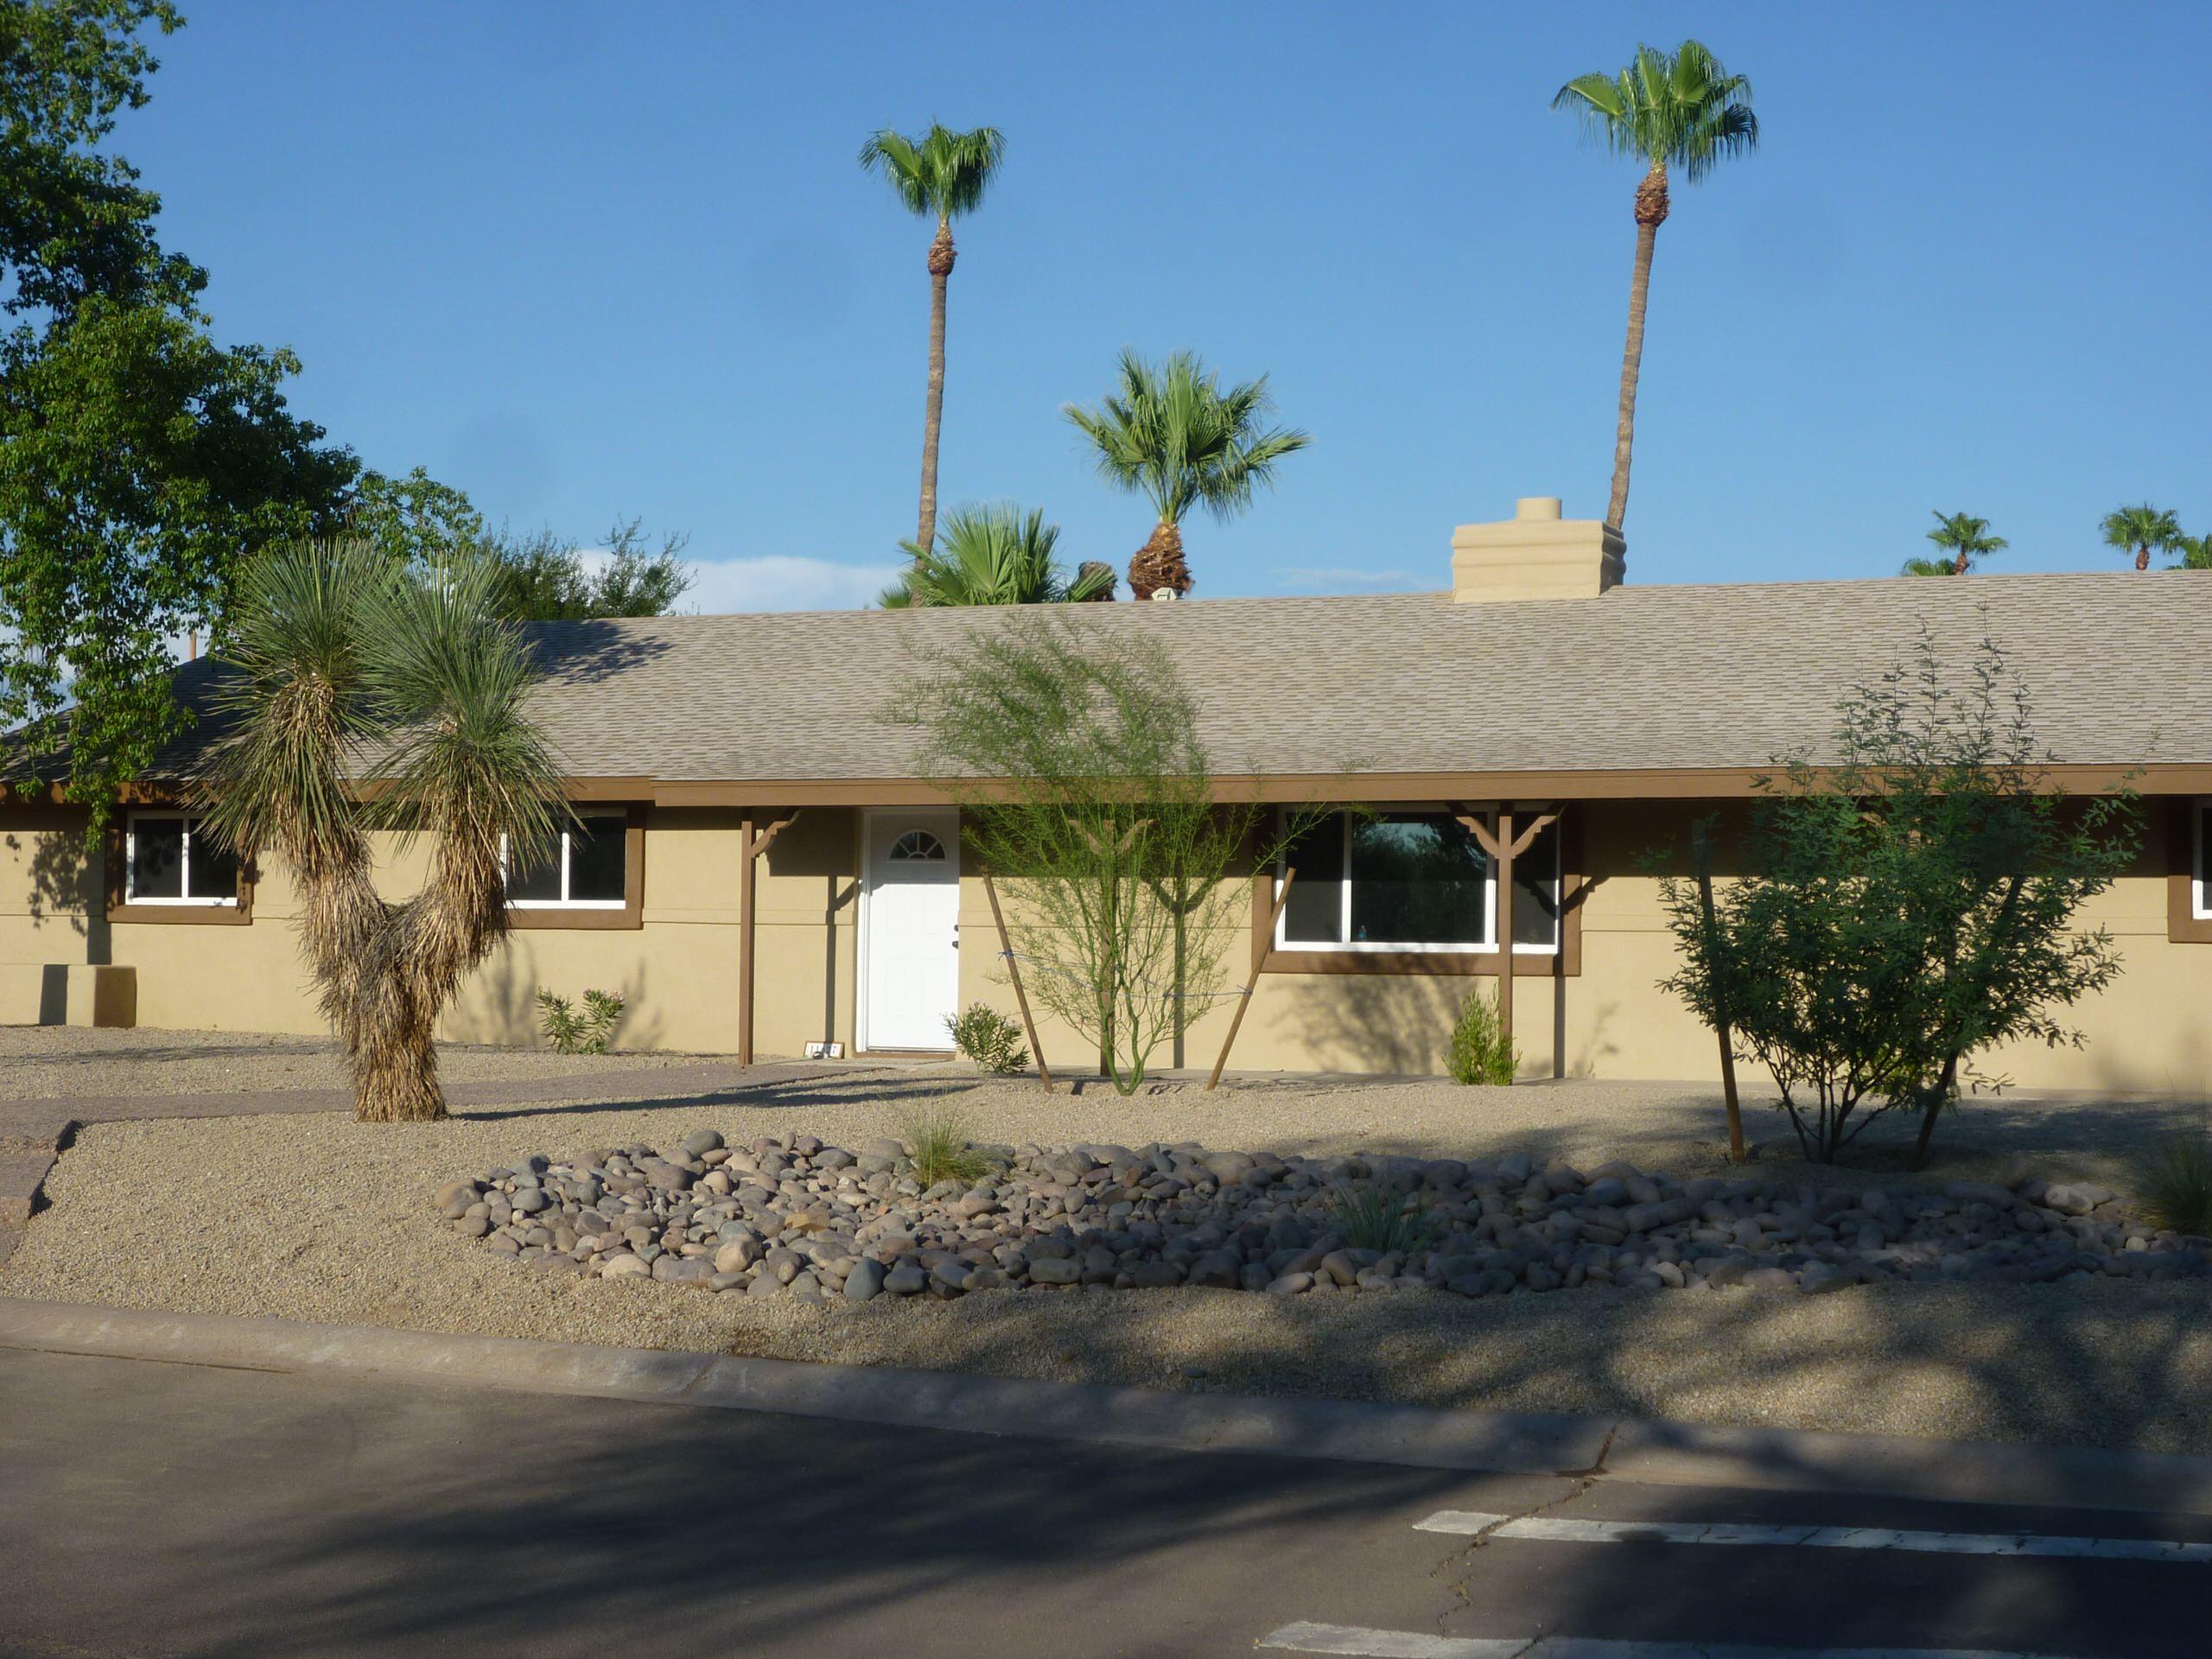 Soaptree Yucca, Palo Verde, Mesquite, & River Rock